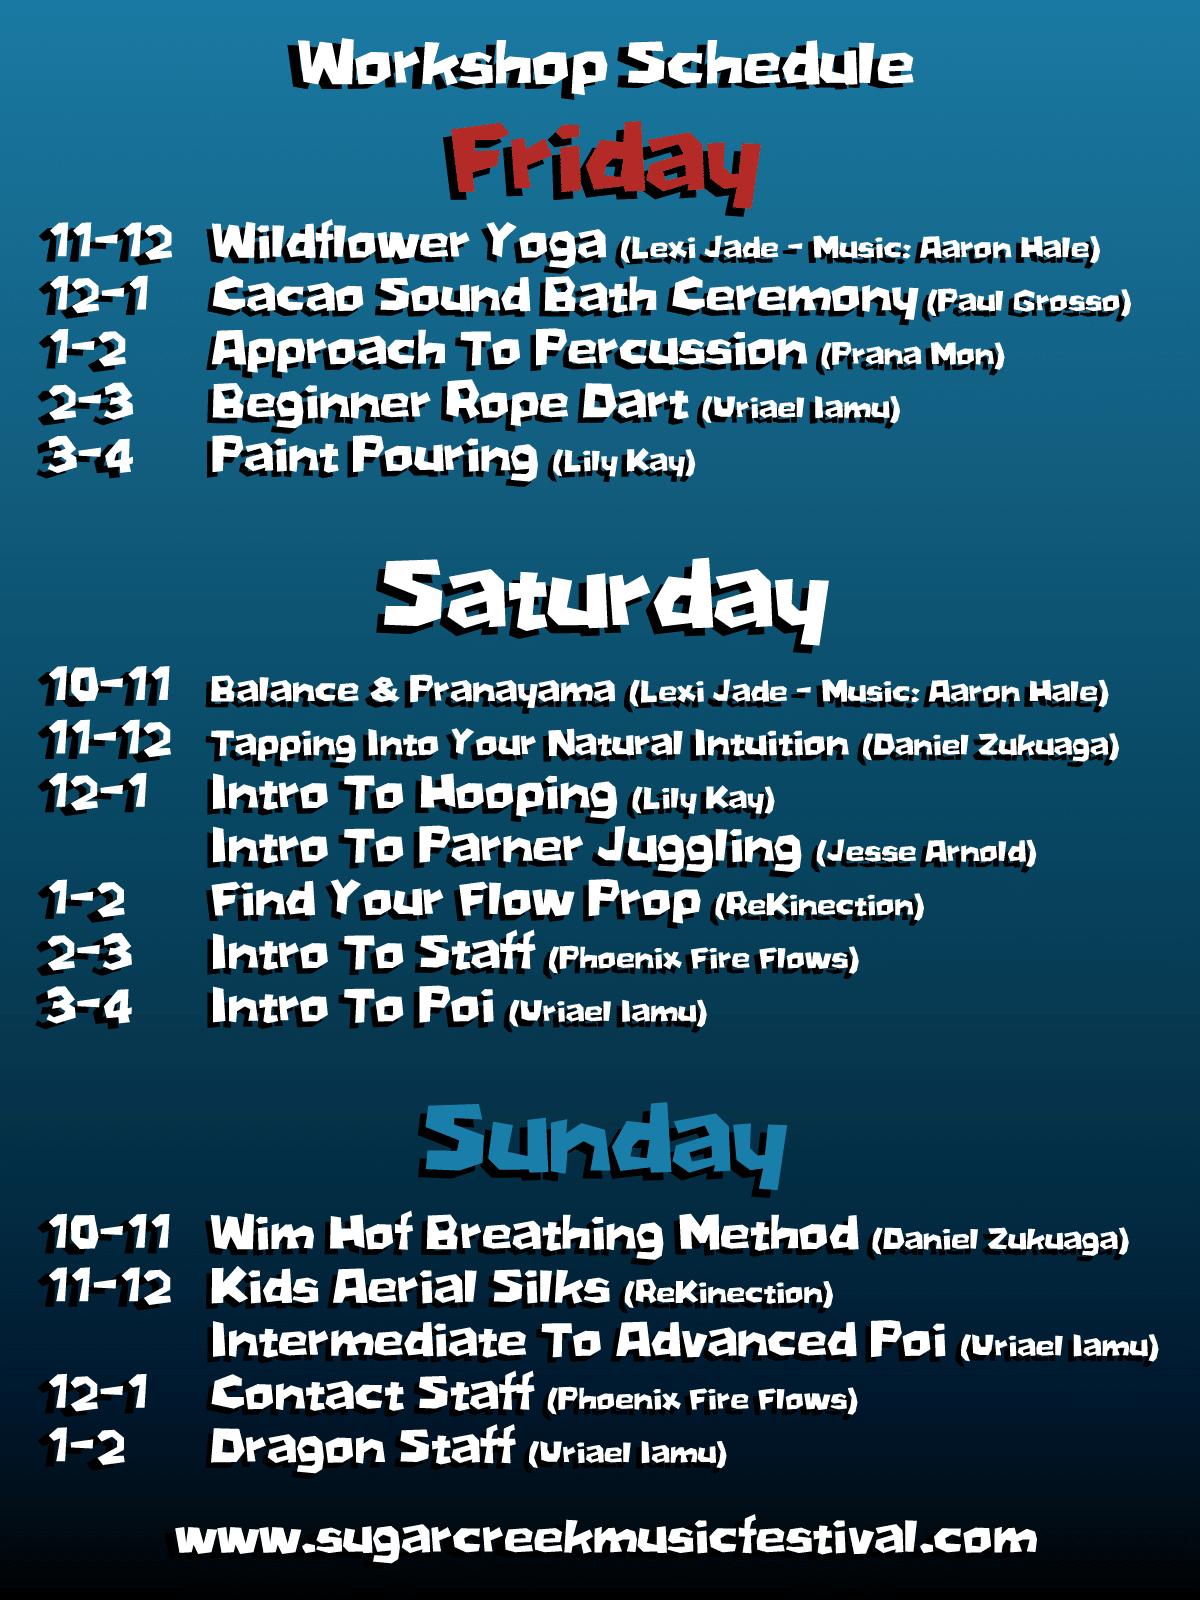 4th of July Bash Workshop Schedule